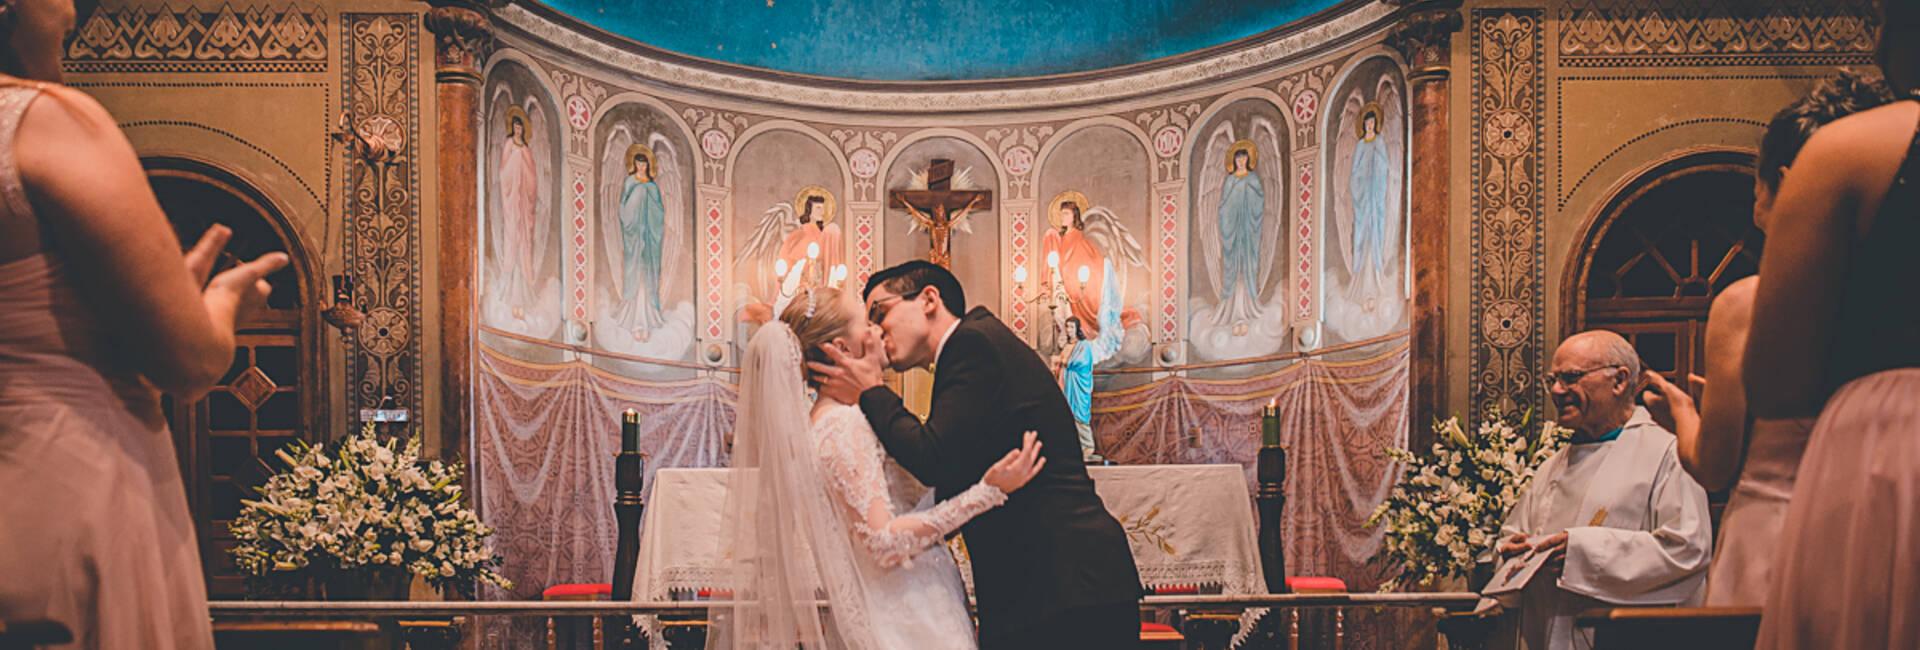 Casamento de Ludimila + Lucas